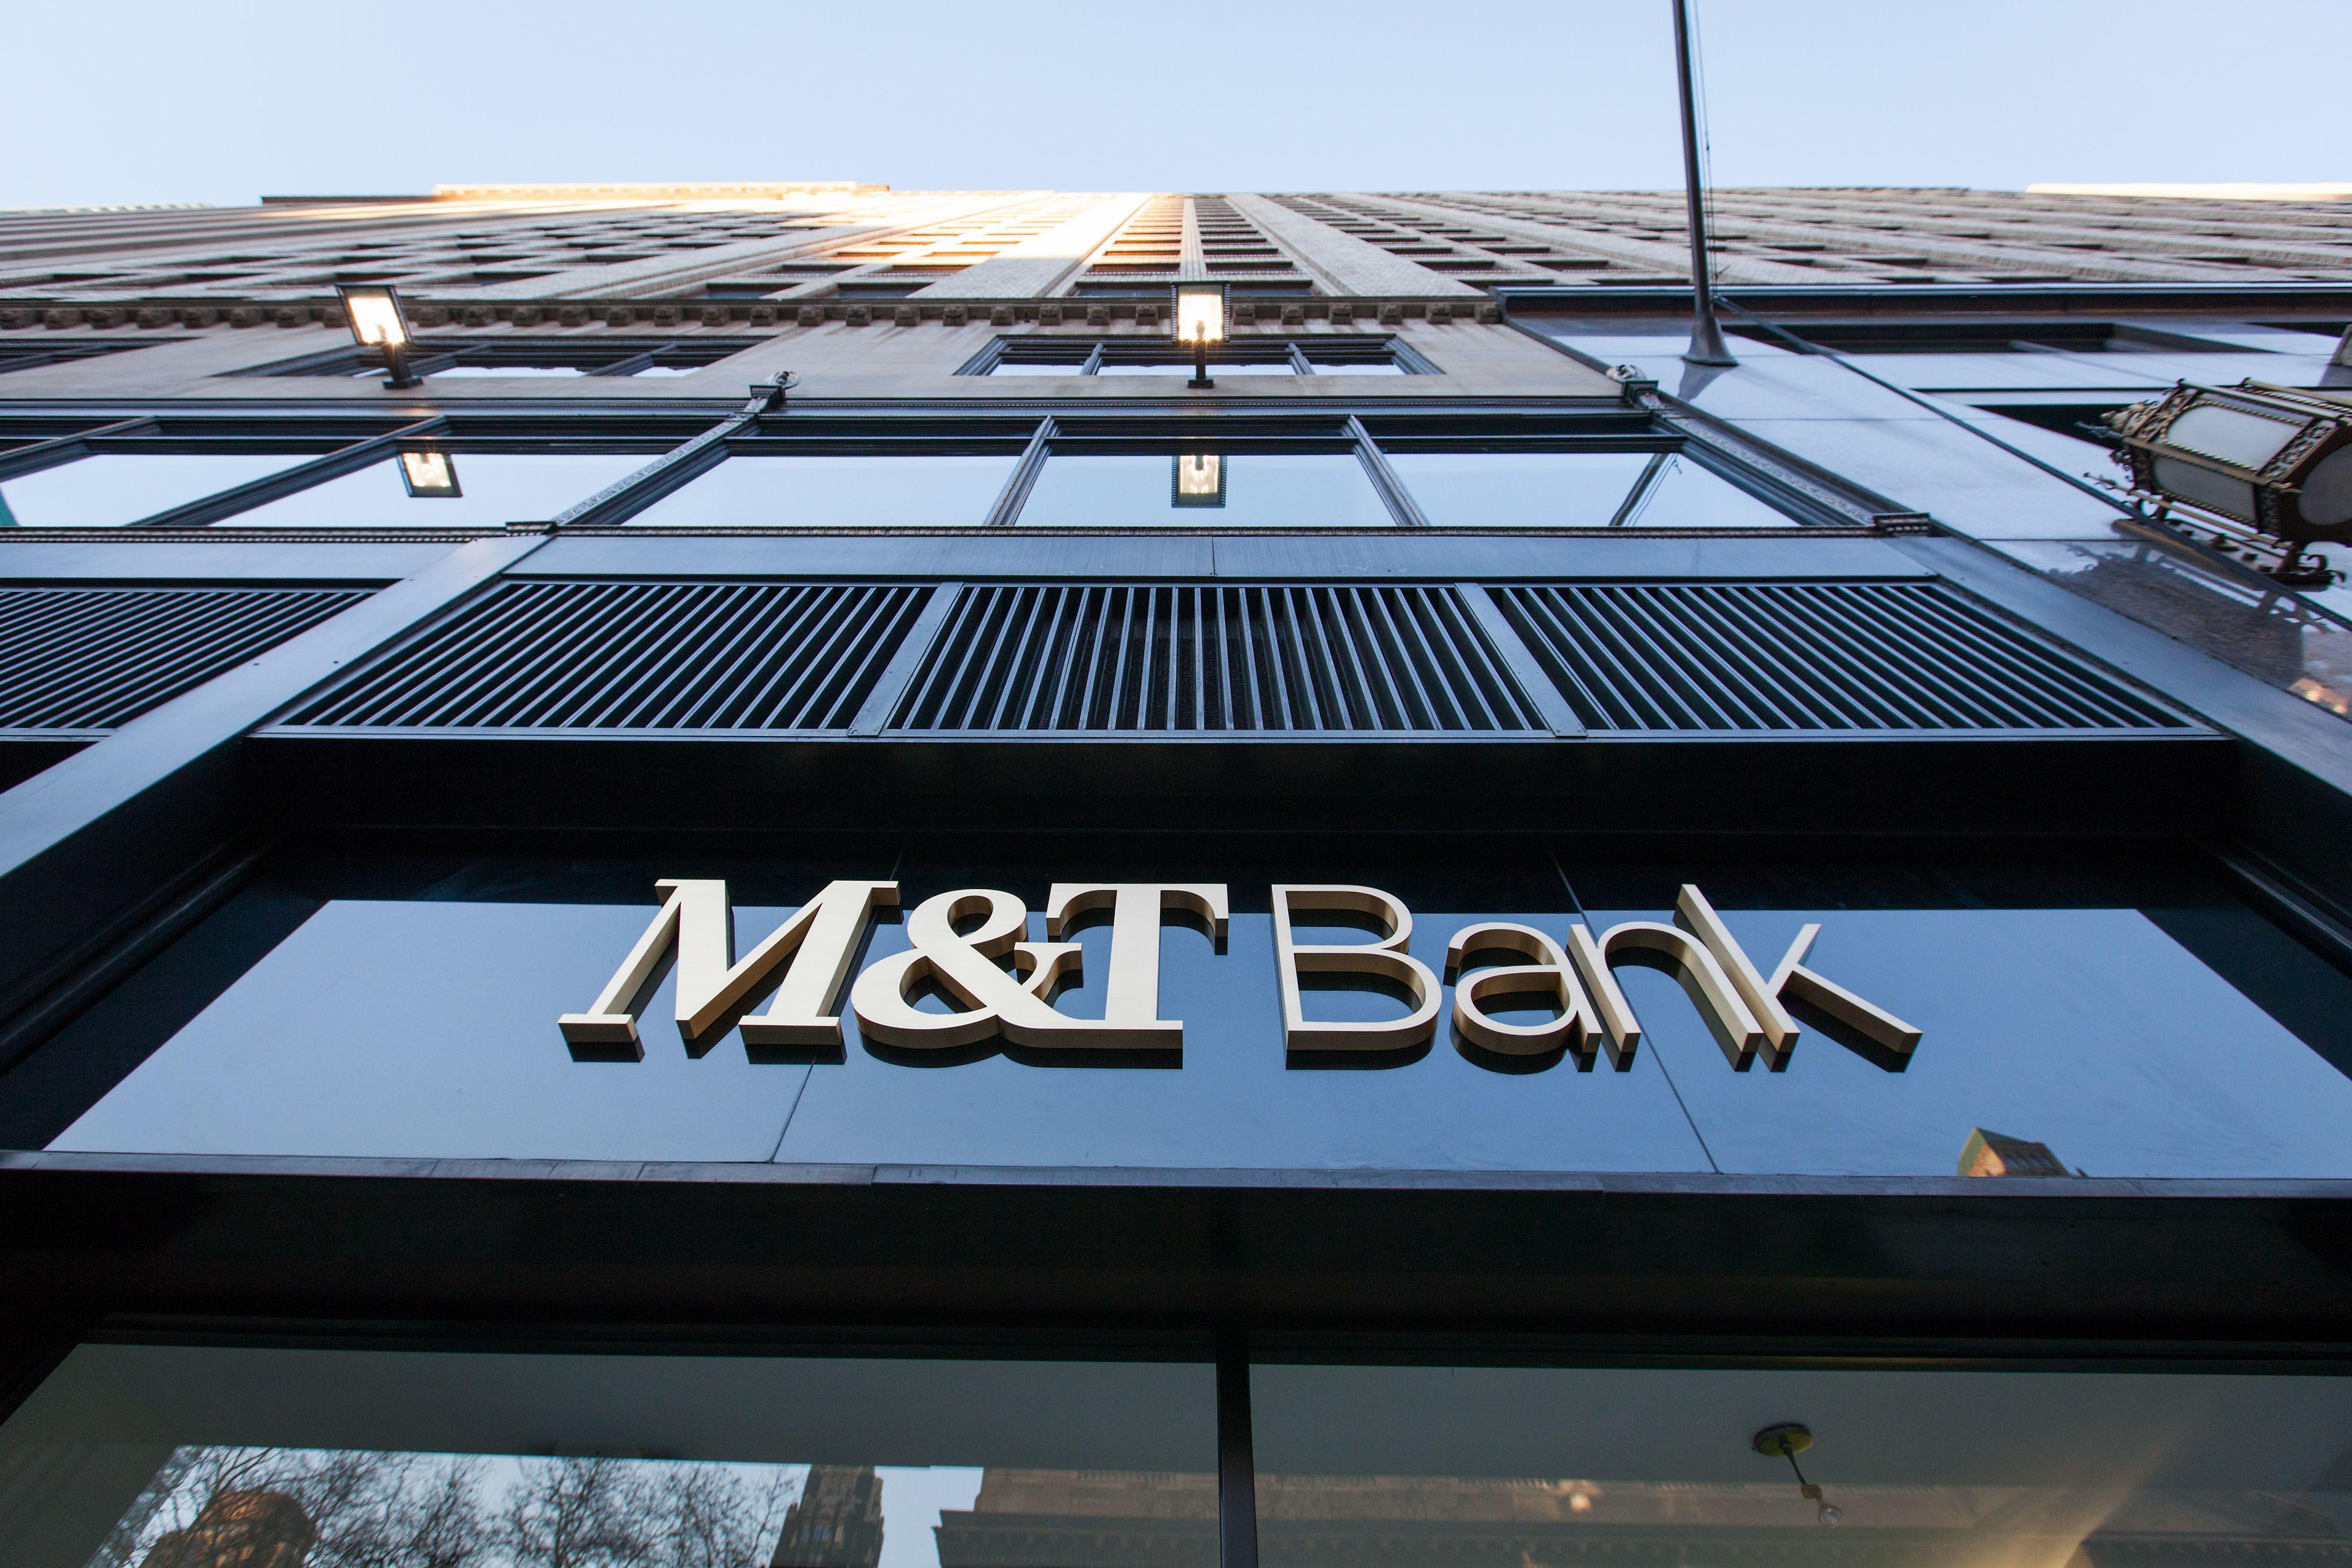 americanbanker.com - Allissa Kline - M&T, awaiting Fed's approval of merger, unveils reinvestment plan